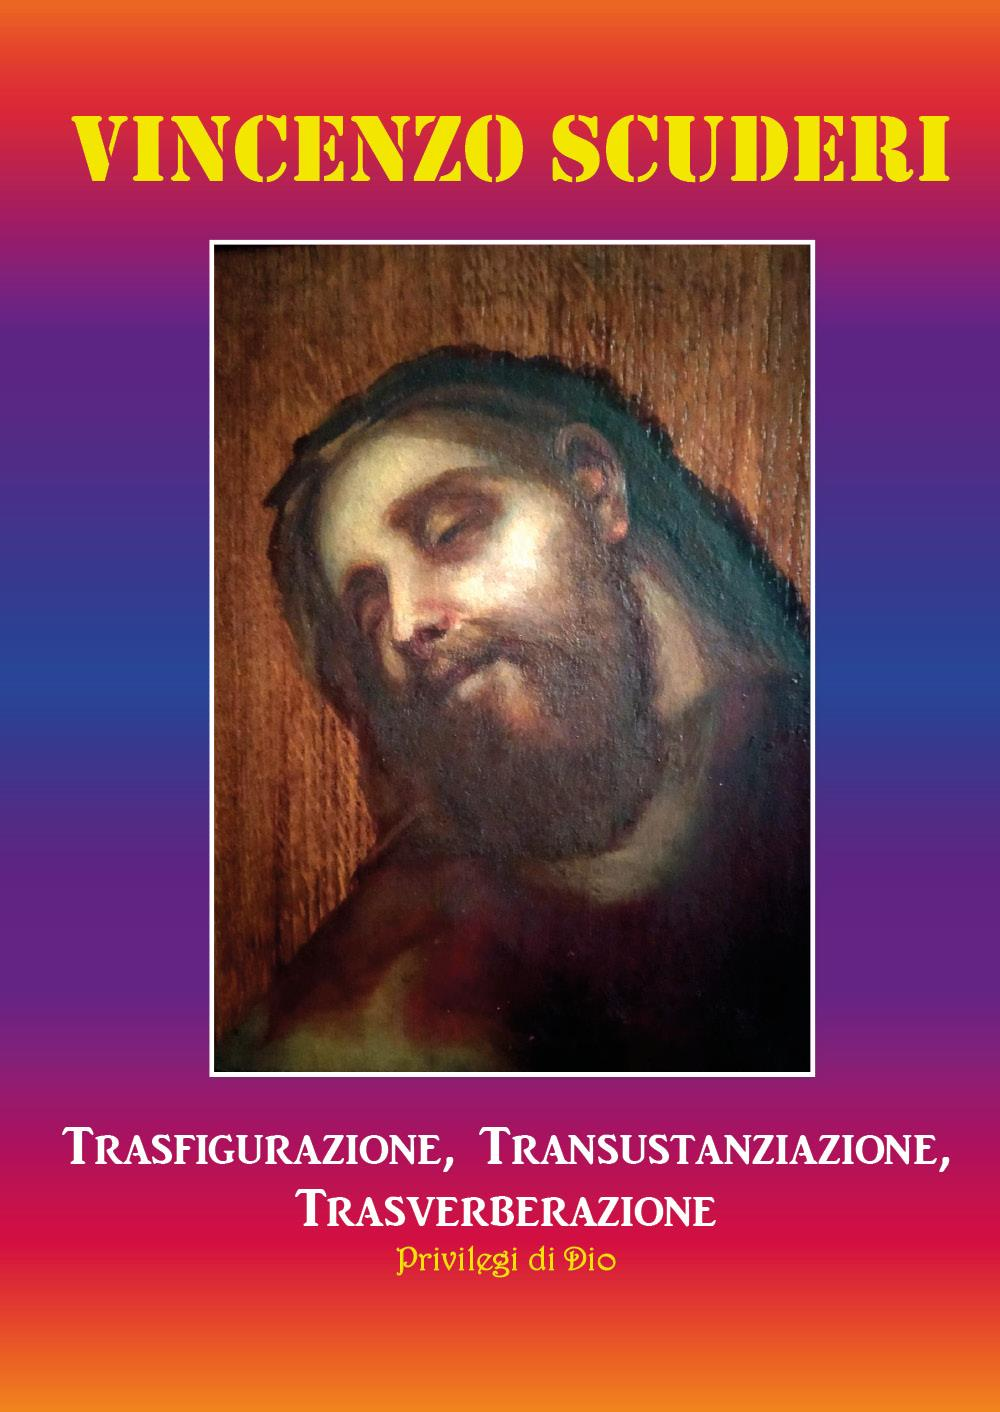 Trasfigurazione, transustanziazione, transverberazione, privilegi di Dio